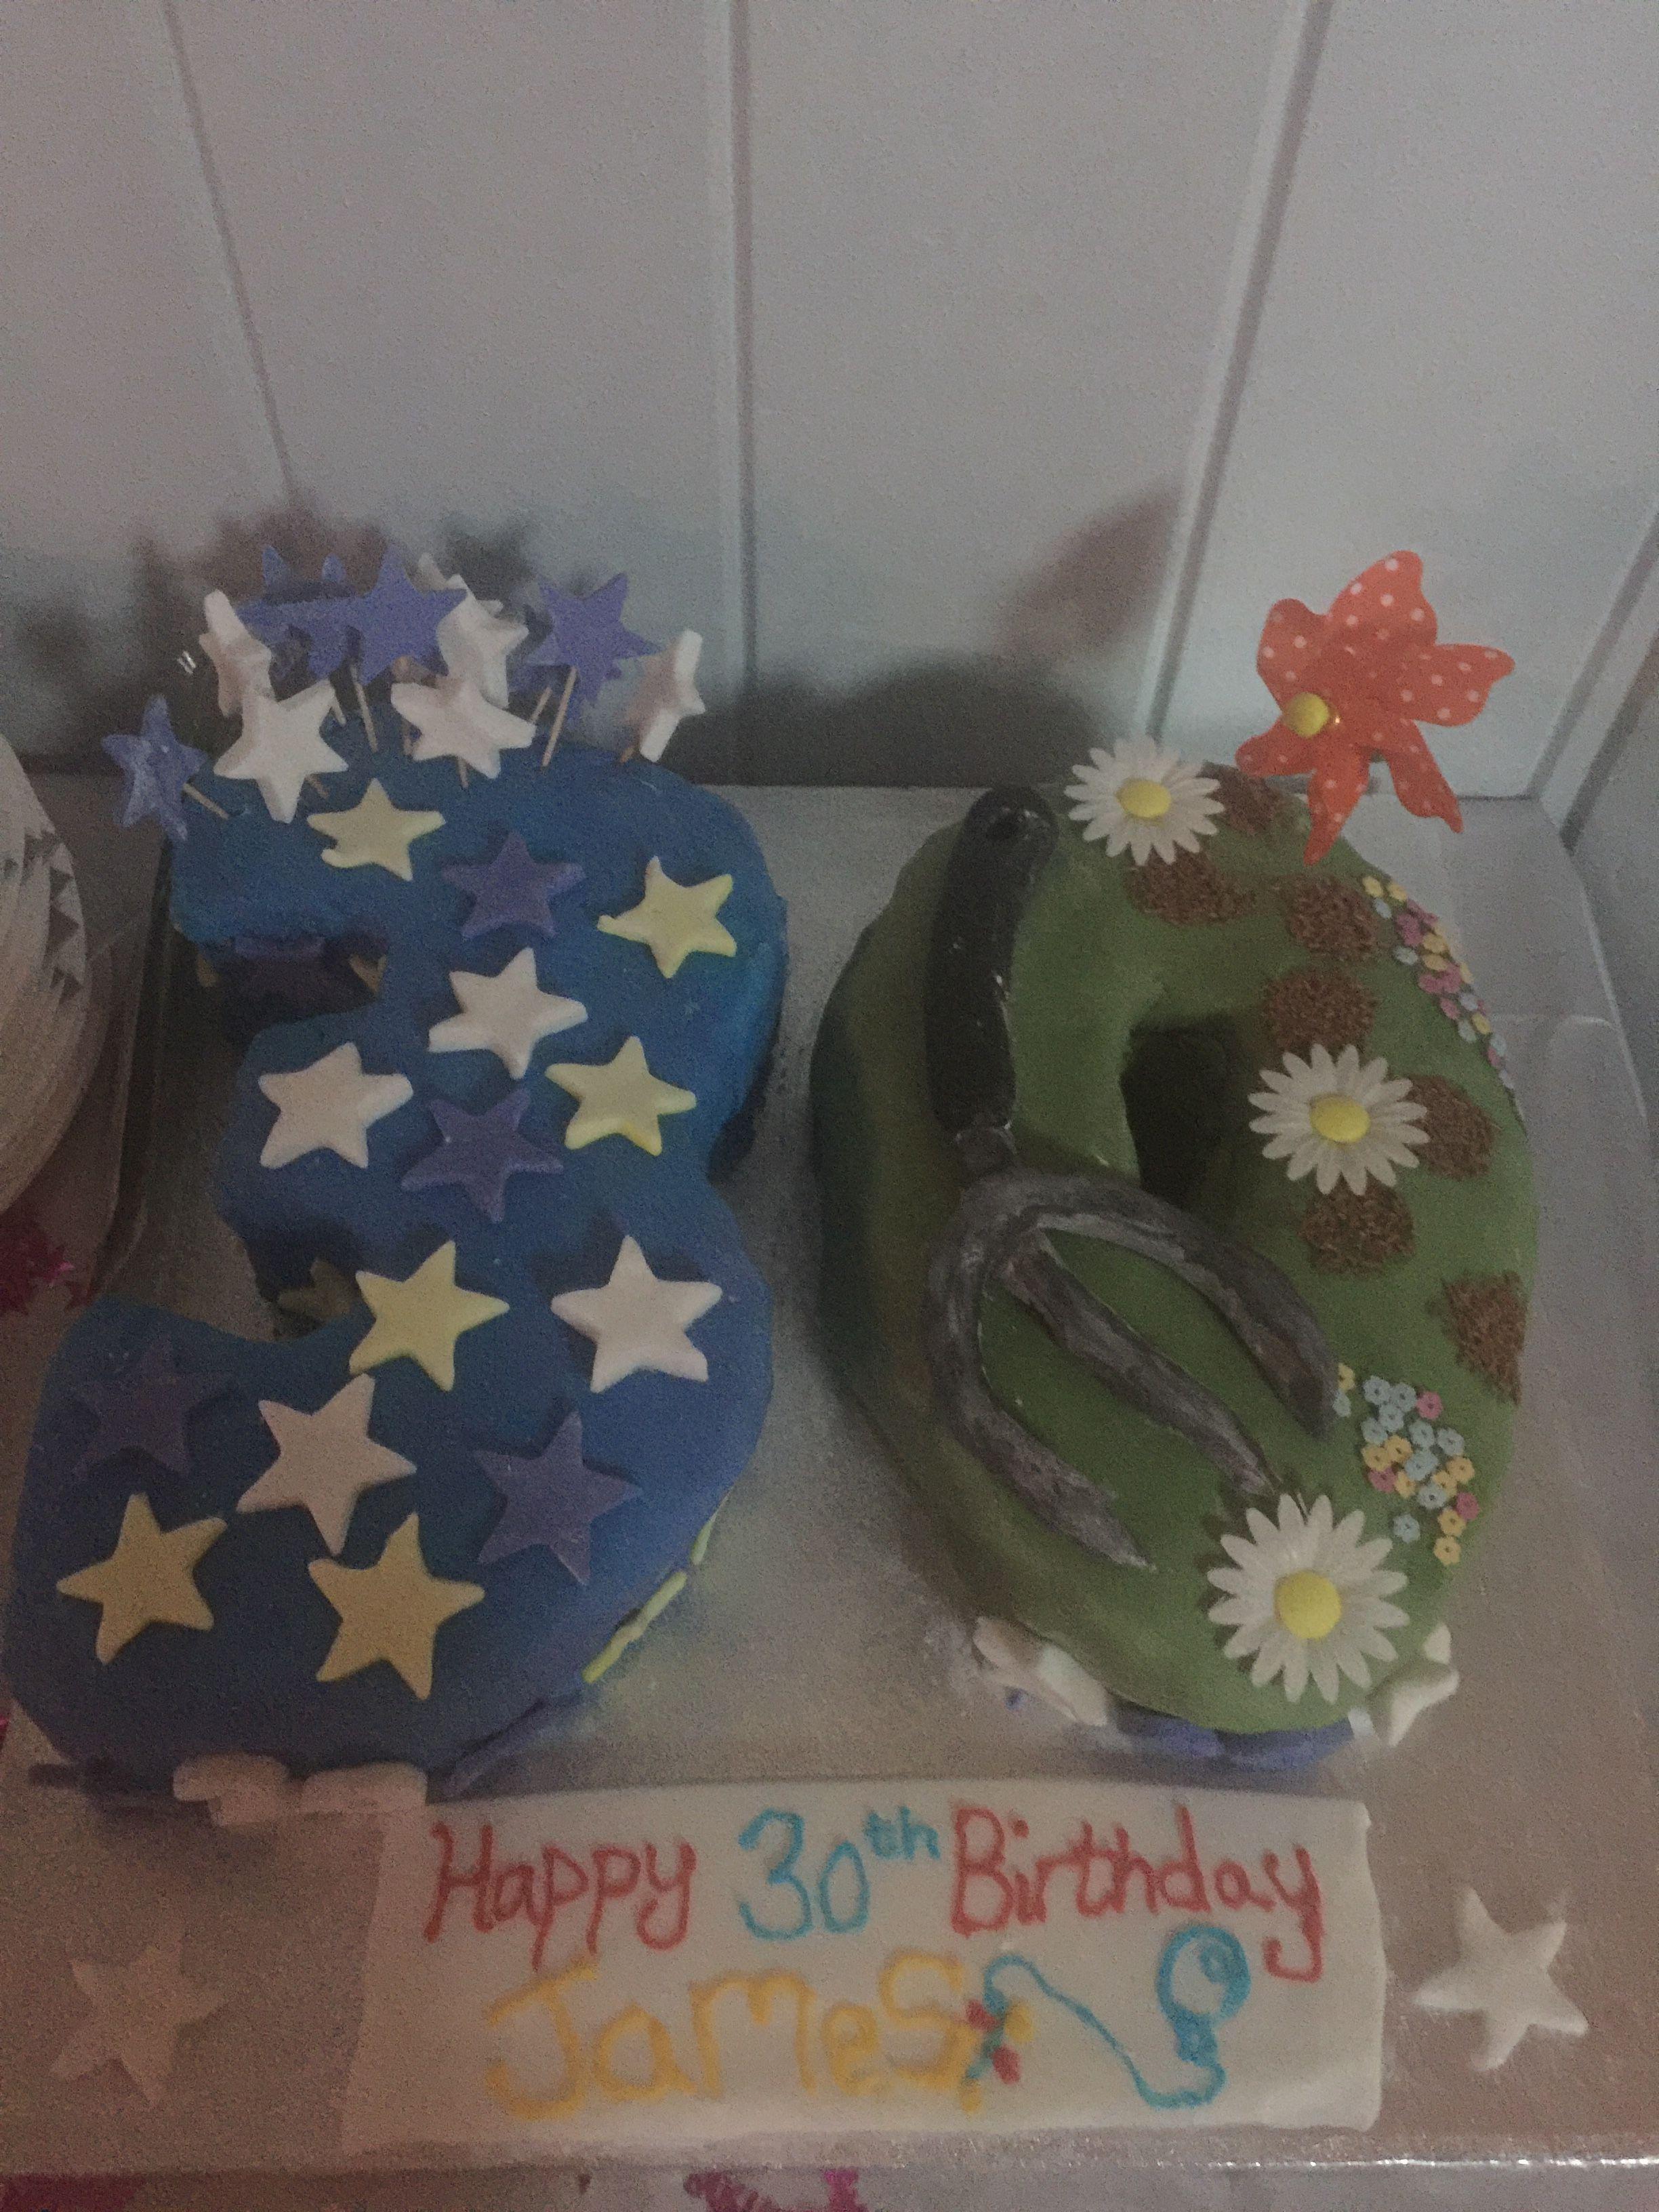 30th birthday cake 30 birthday cake, 30th birthday, Cake